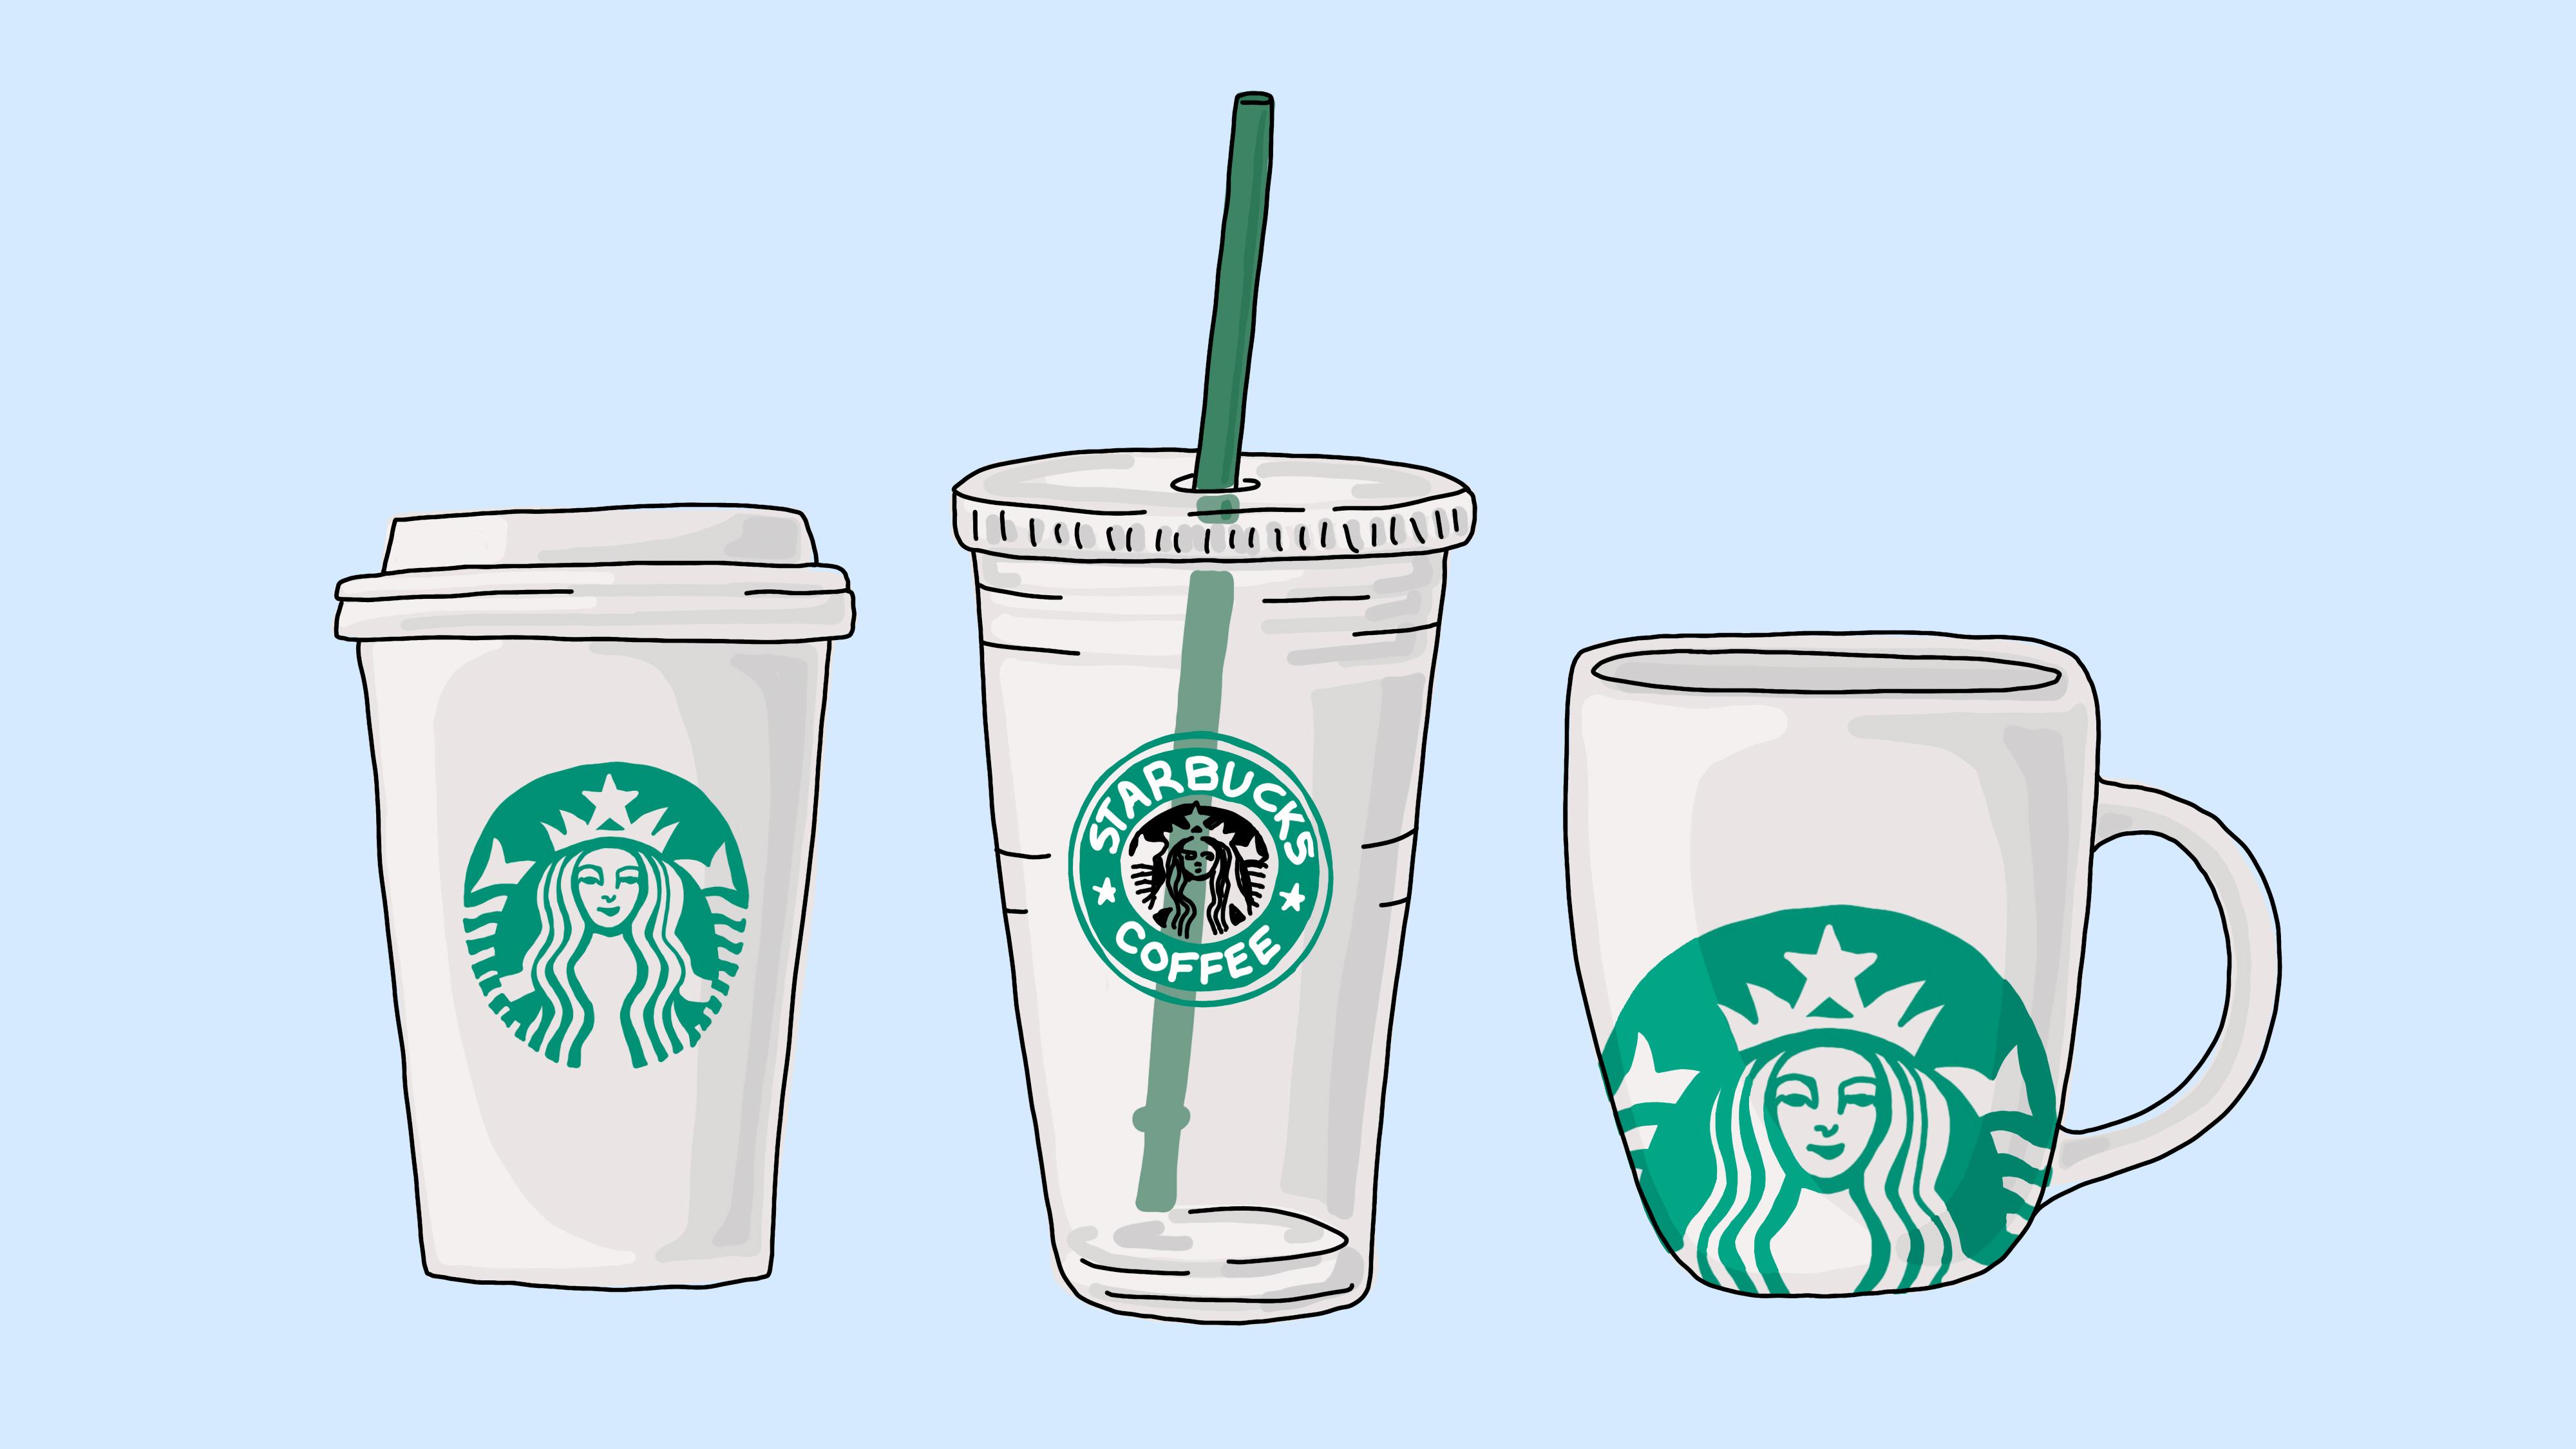 "I've spent $20,000 on Starbucks in the past 12 years"" - Vox"